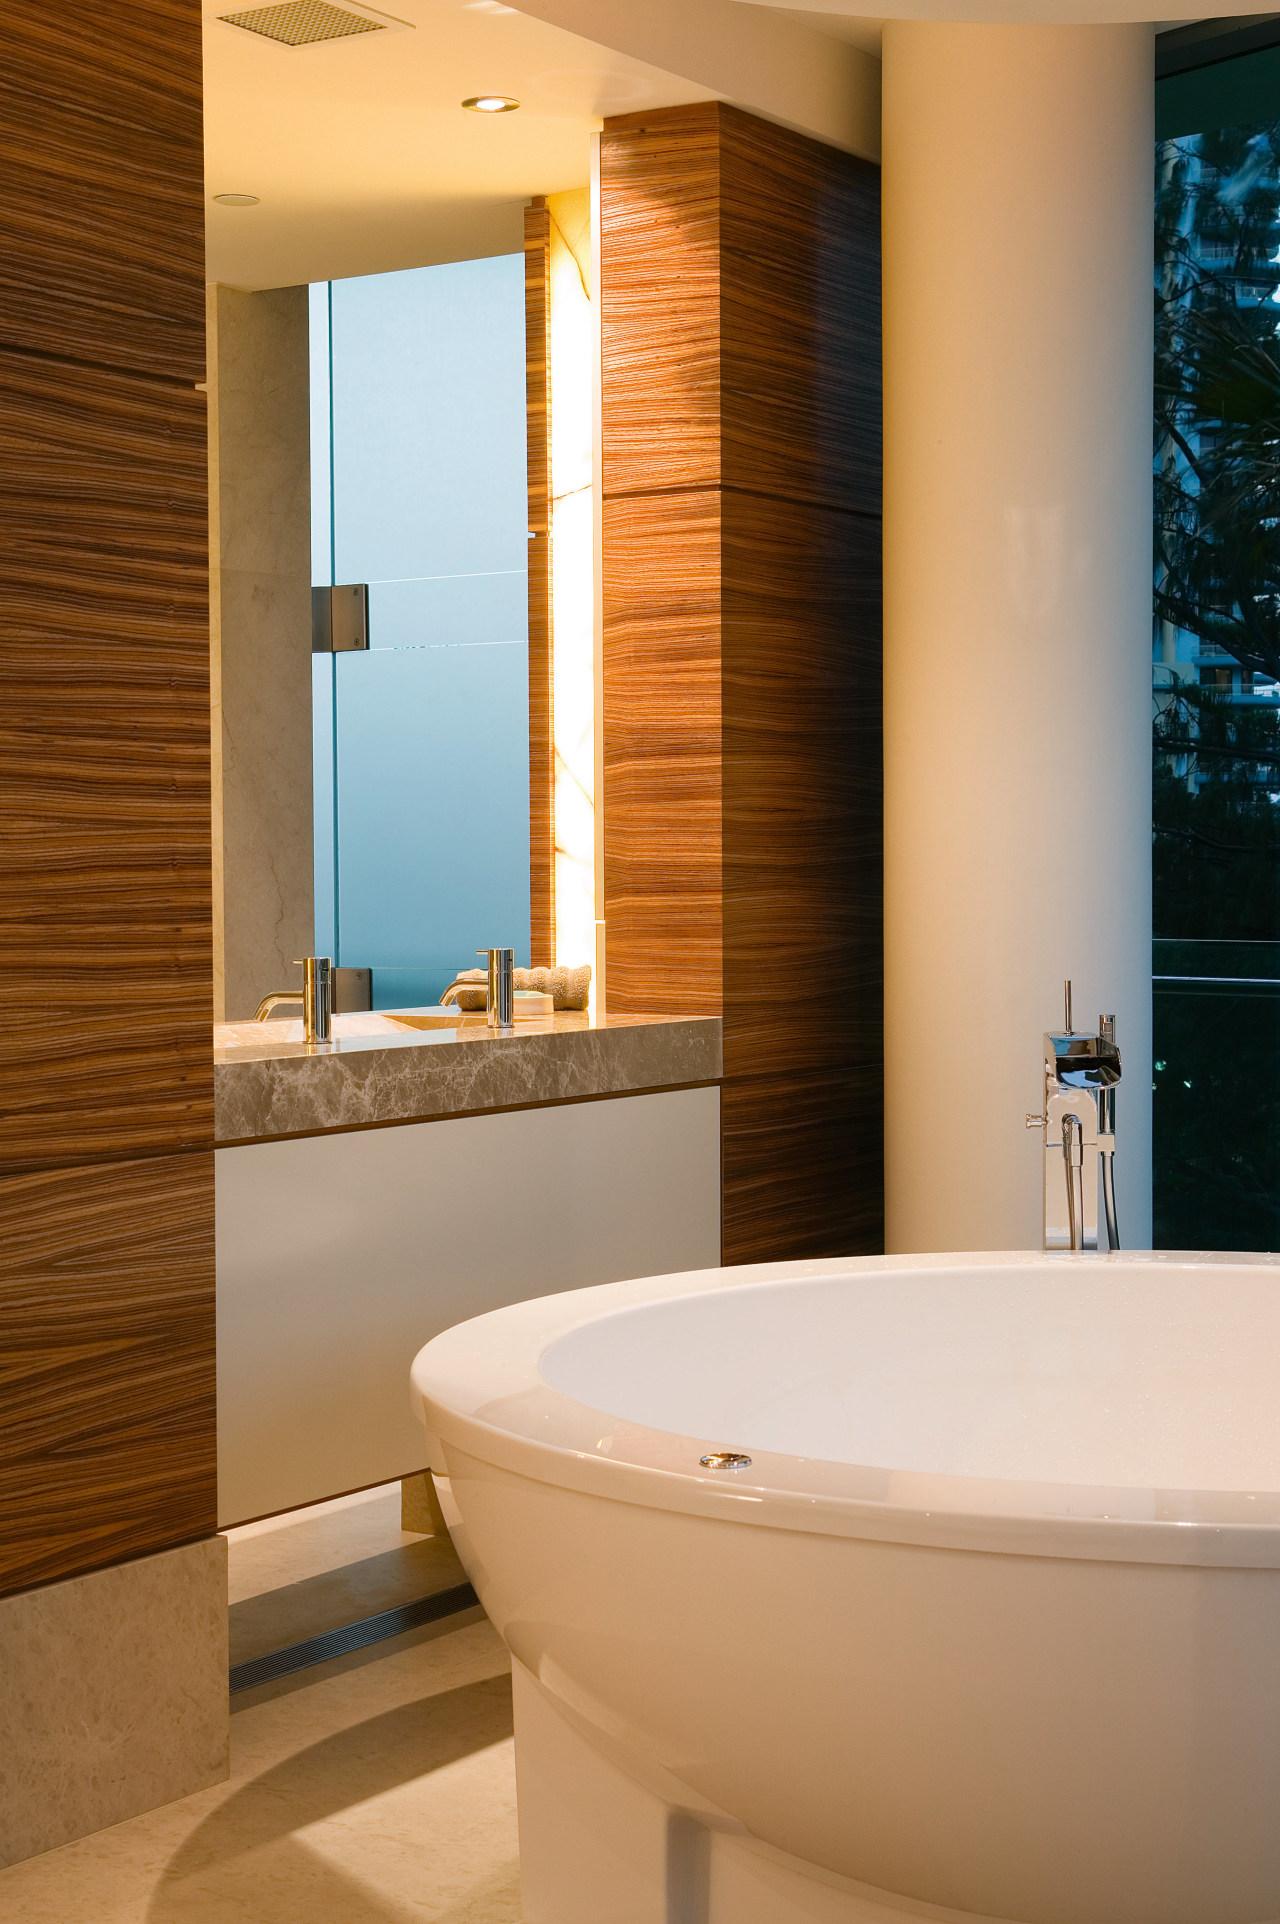 The clean lines of the freestanding spa bath architecture, bathroom, bathroom accessory, floor, home, interior design, plumbing fixture, room, wall, window, brown, orange